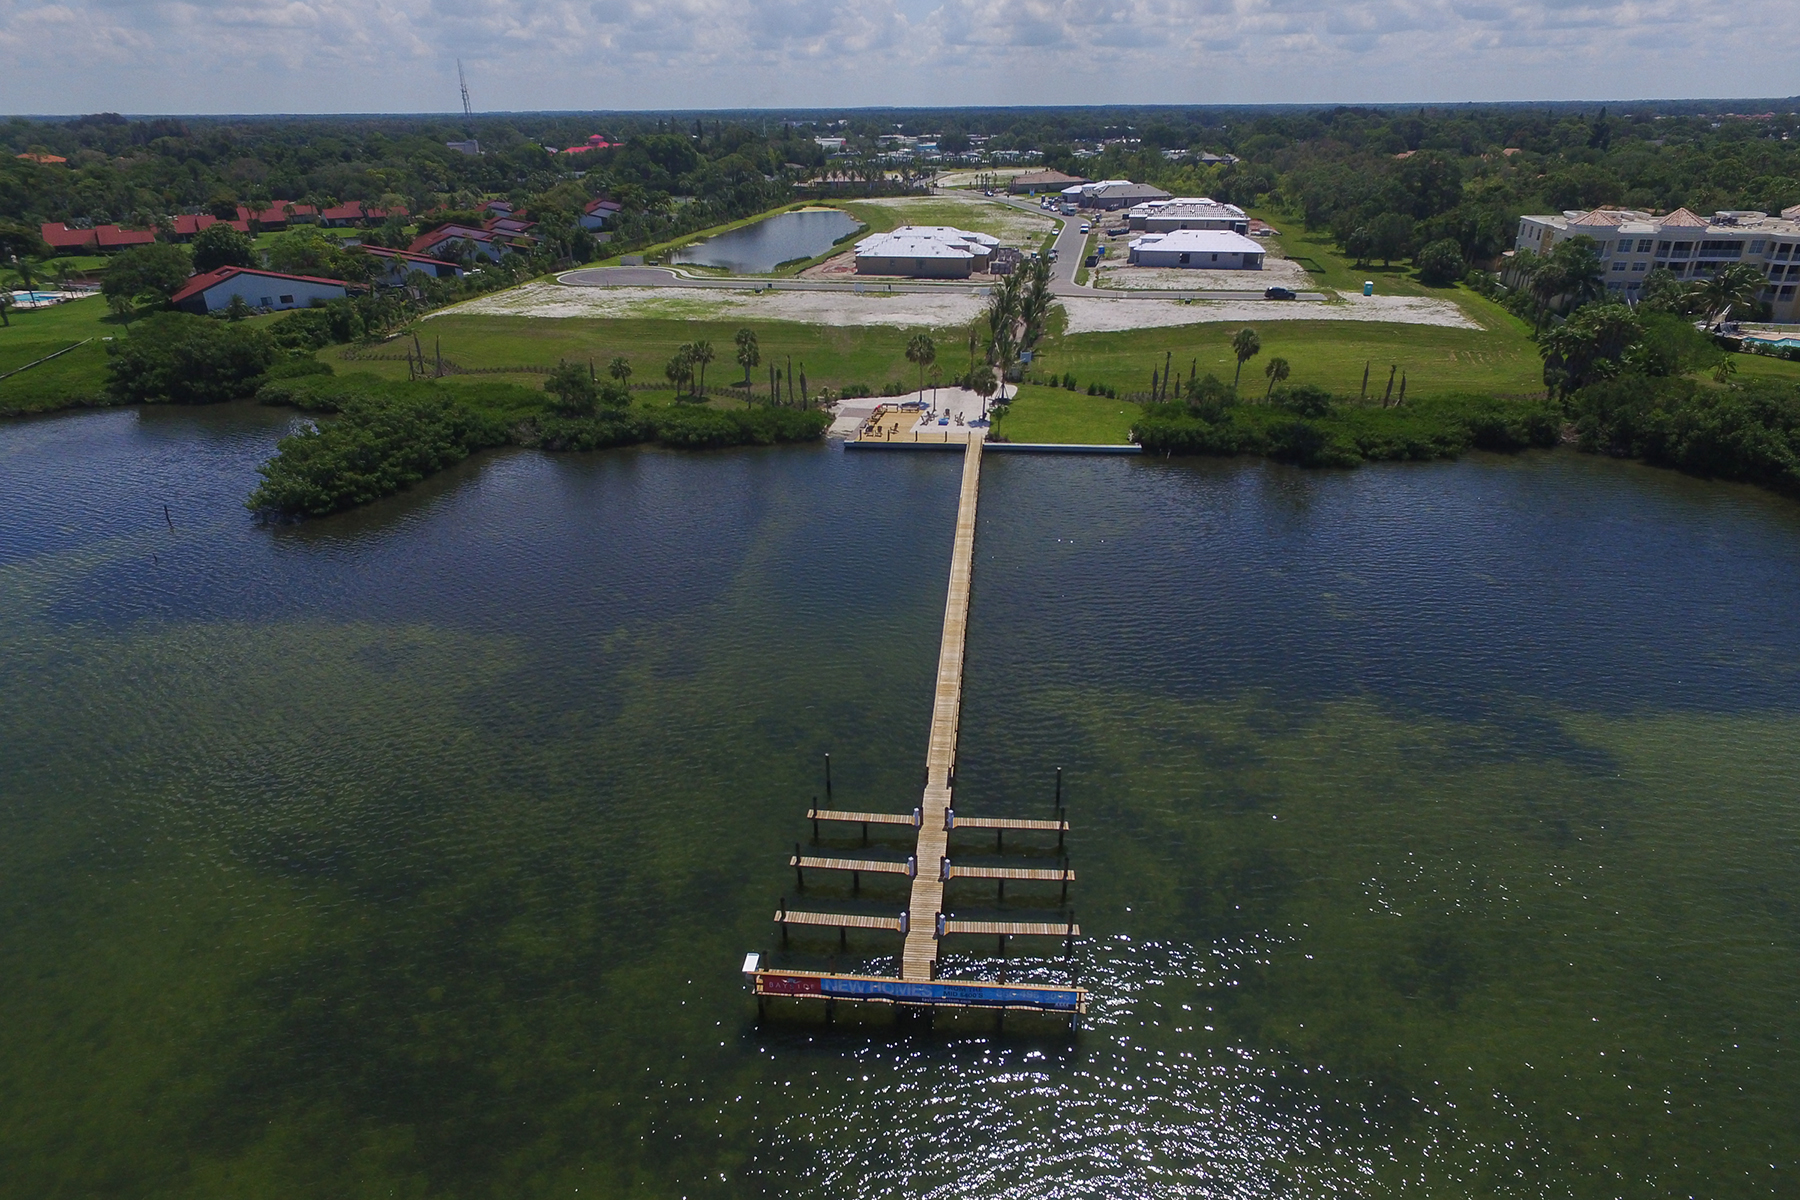 Land for Sale at BAYSIDE 37 Masthead Dr 37 Osprey, Florida, 34229 United States